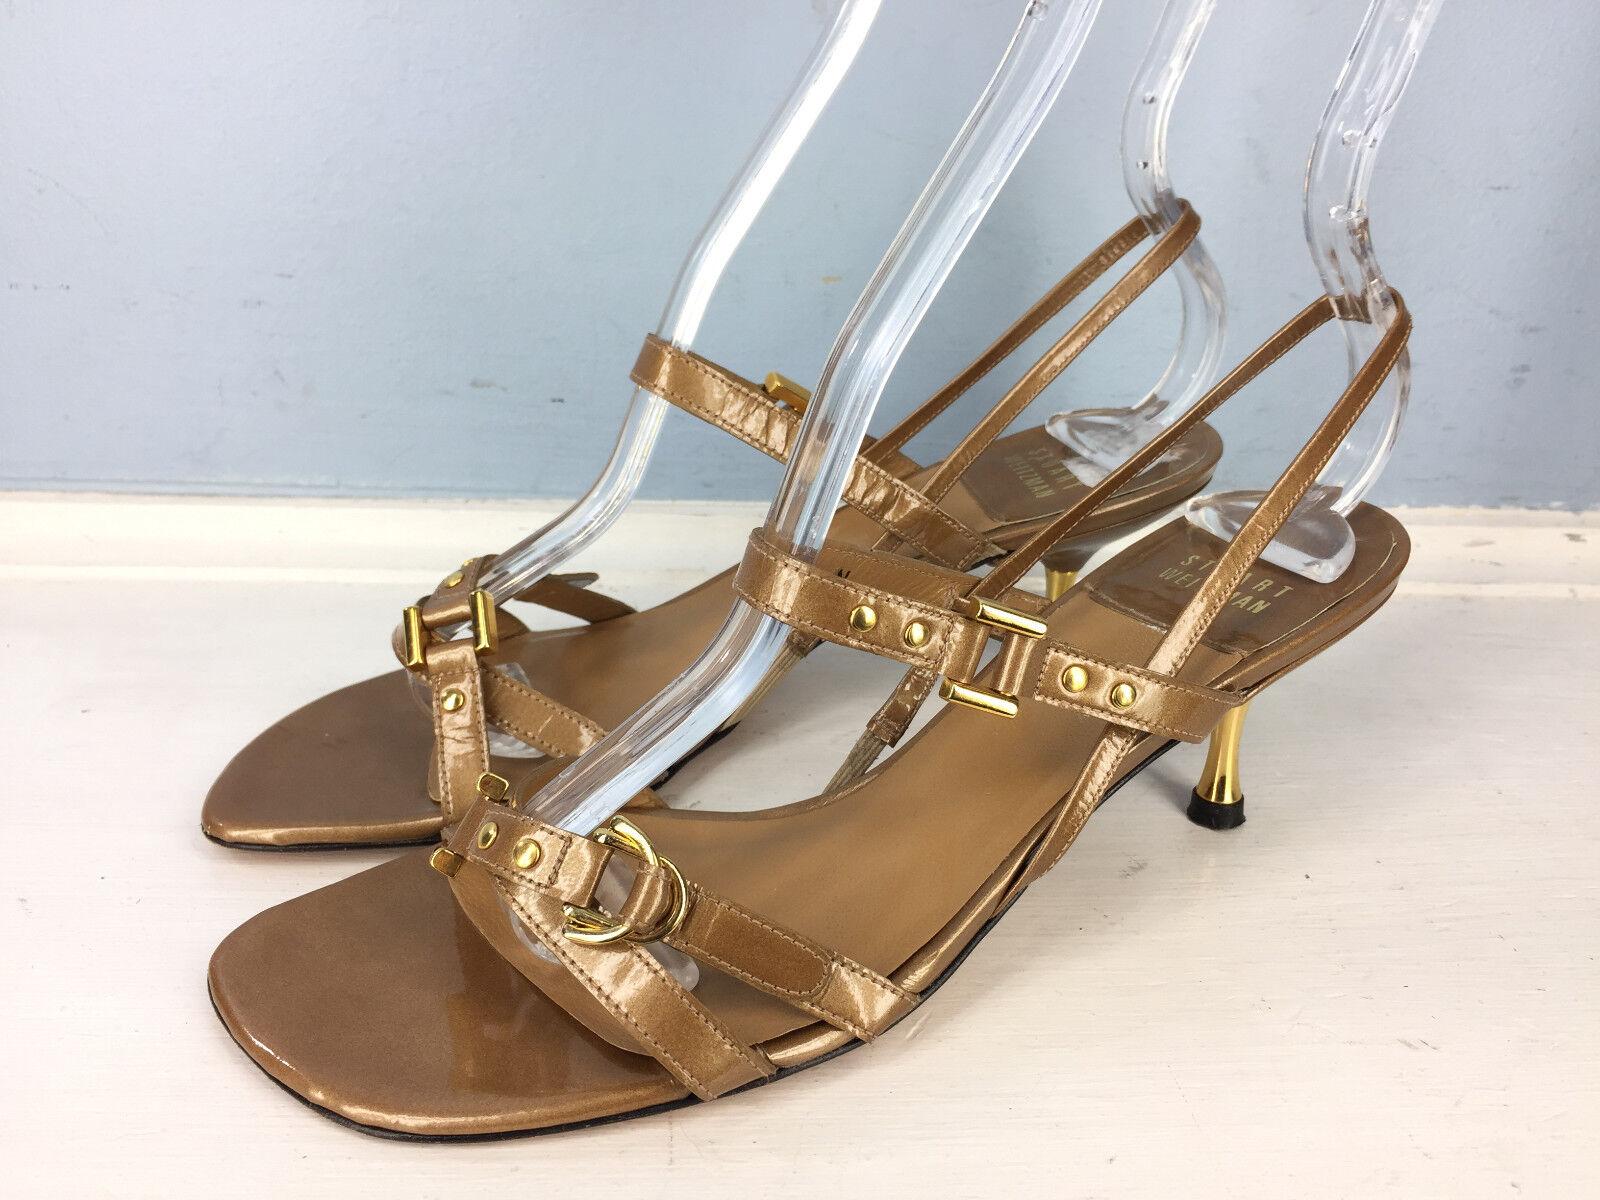 Stuart Weitzman Brown gold Patent Leather Strappy Low kitten Heel Slingback 6.5